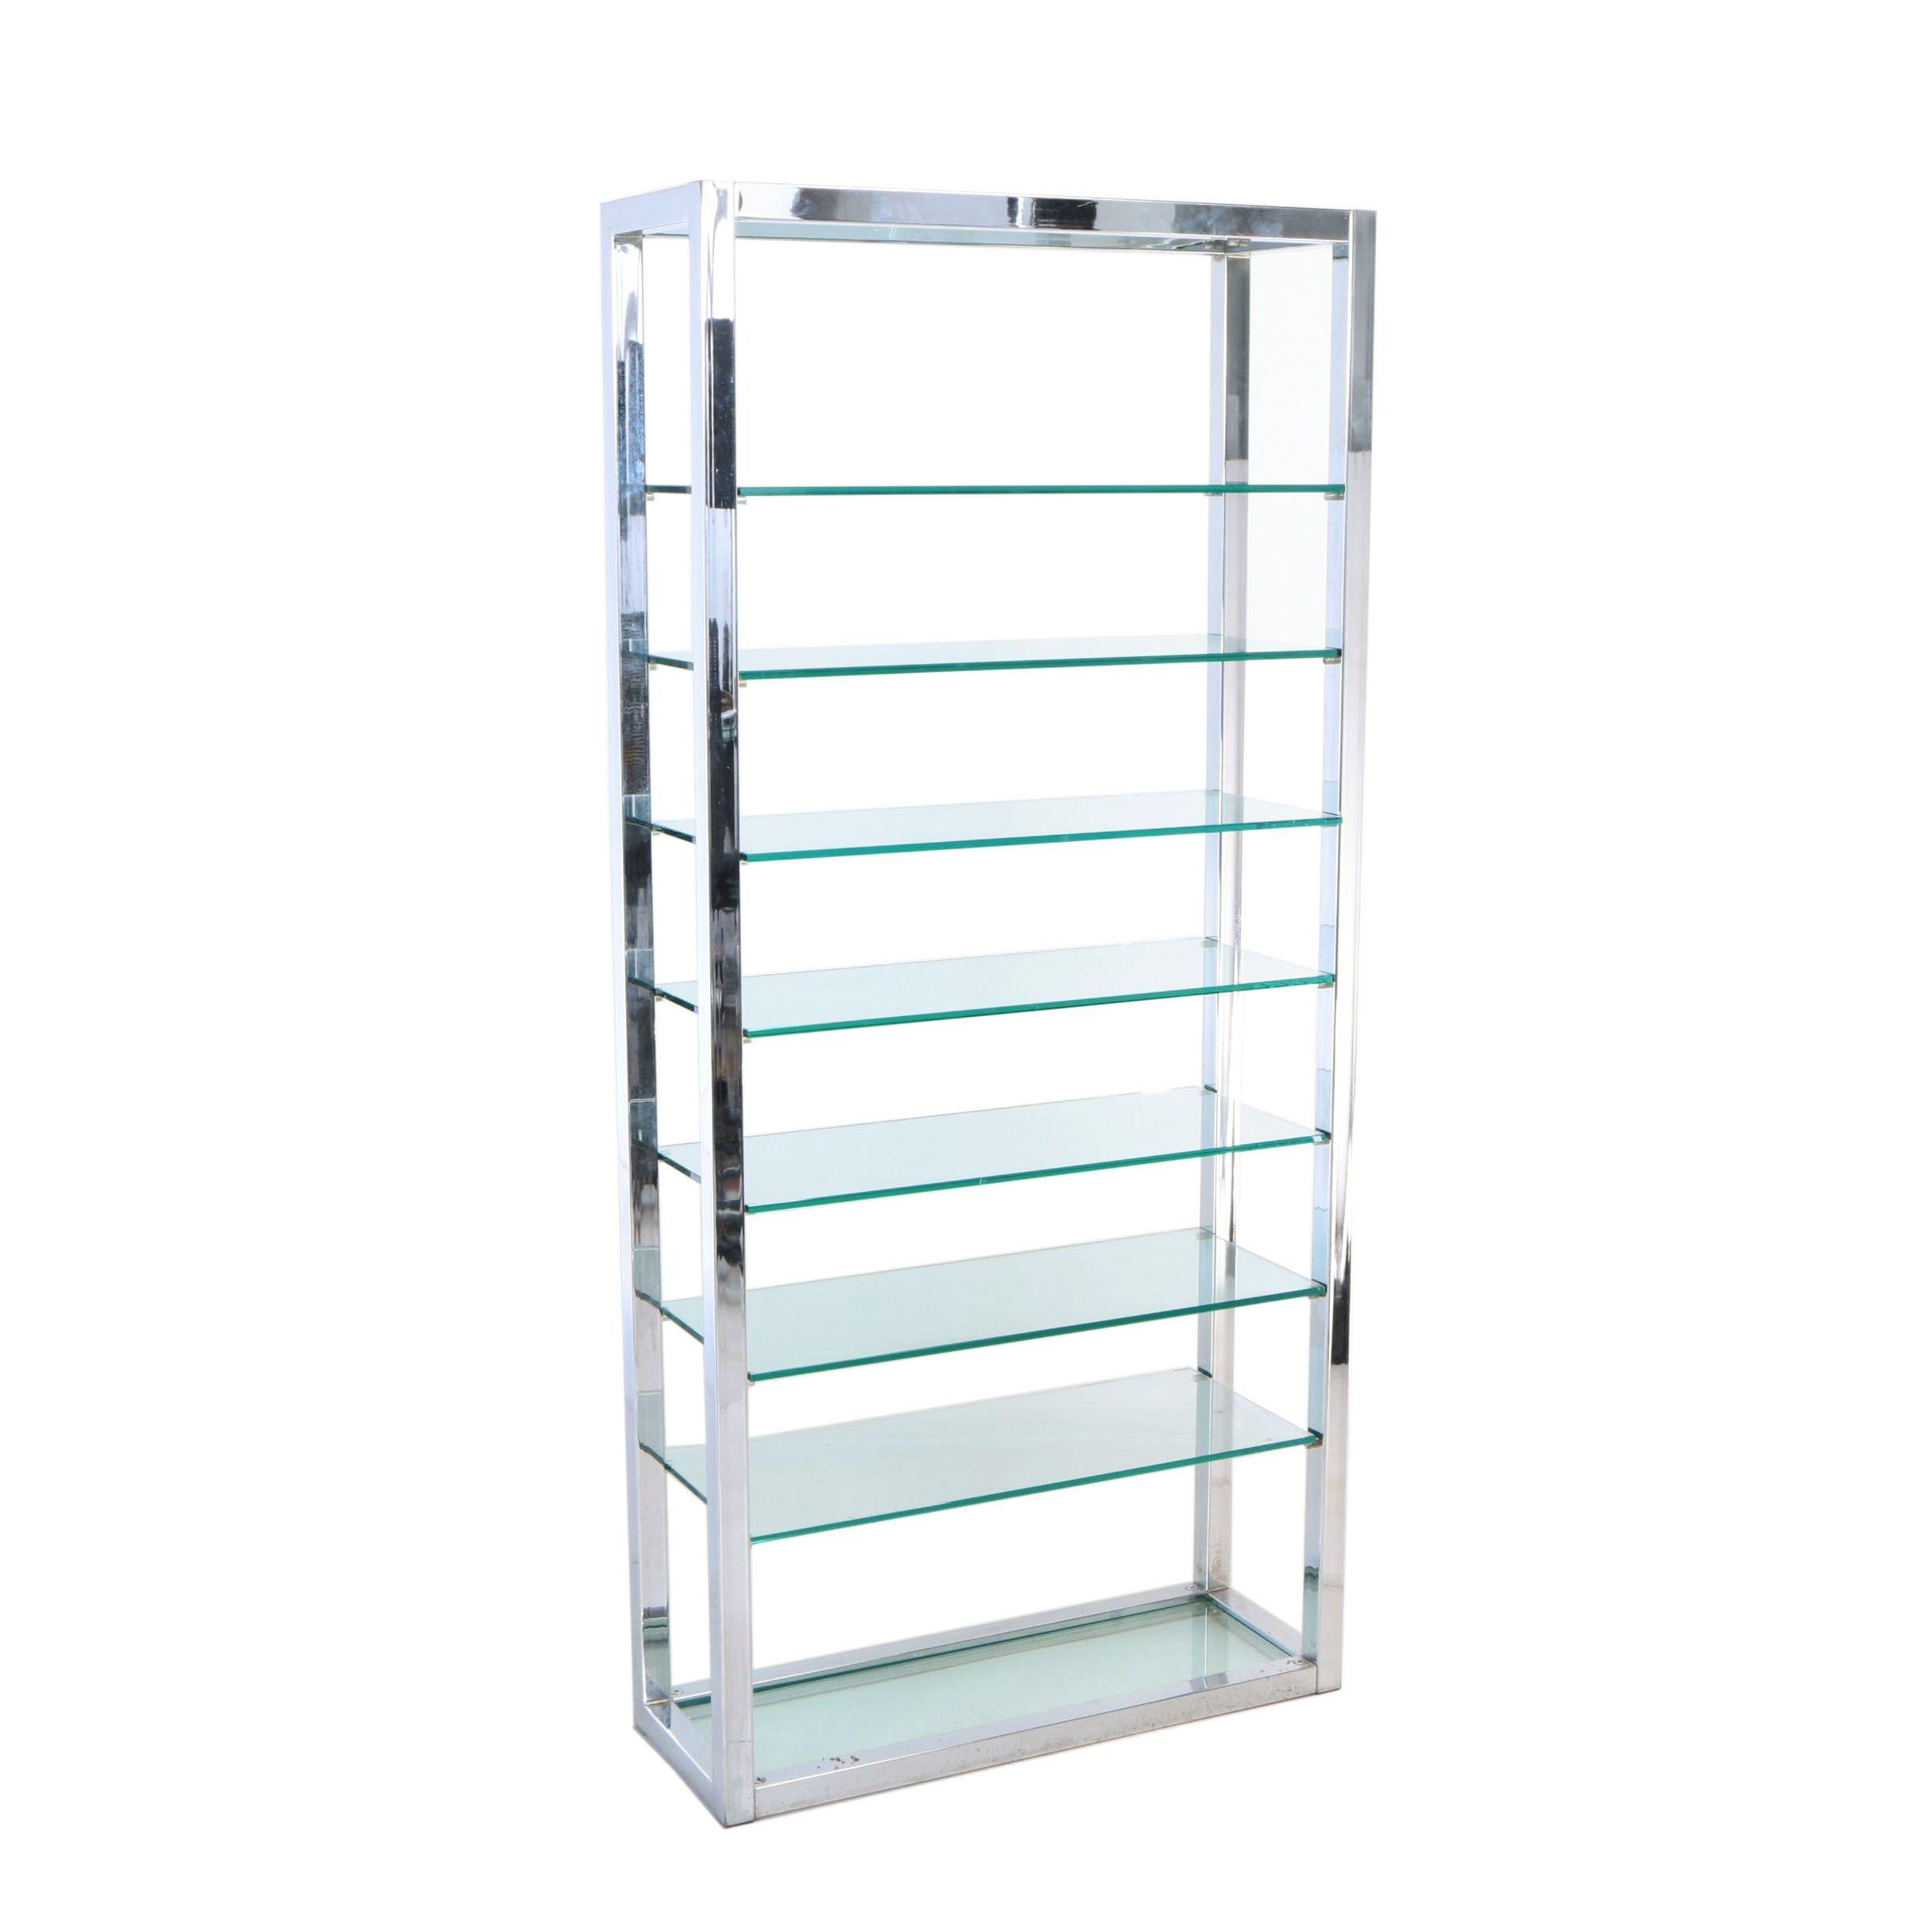 Modernist Chromed-Metal and Glass Étagère, Second Half 20th Century